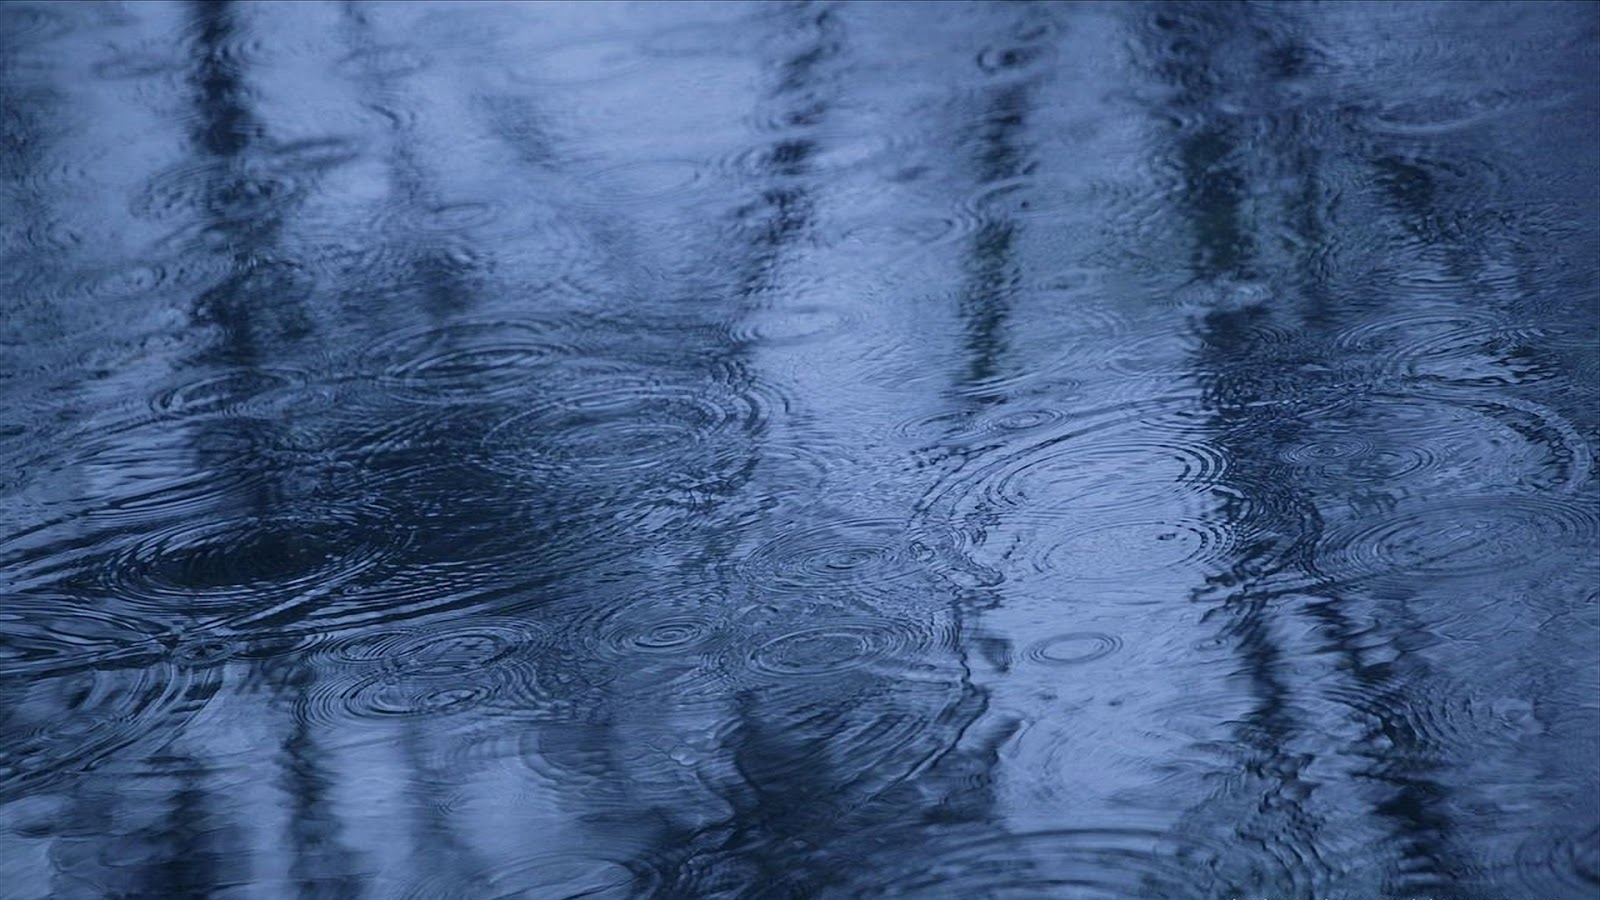 Your Wallpaper: Rainy Day Wallpaper